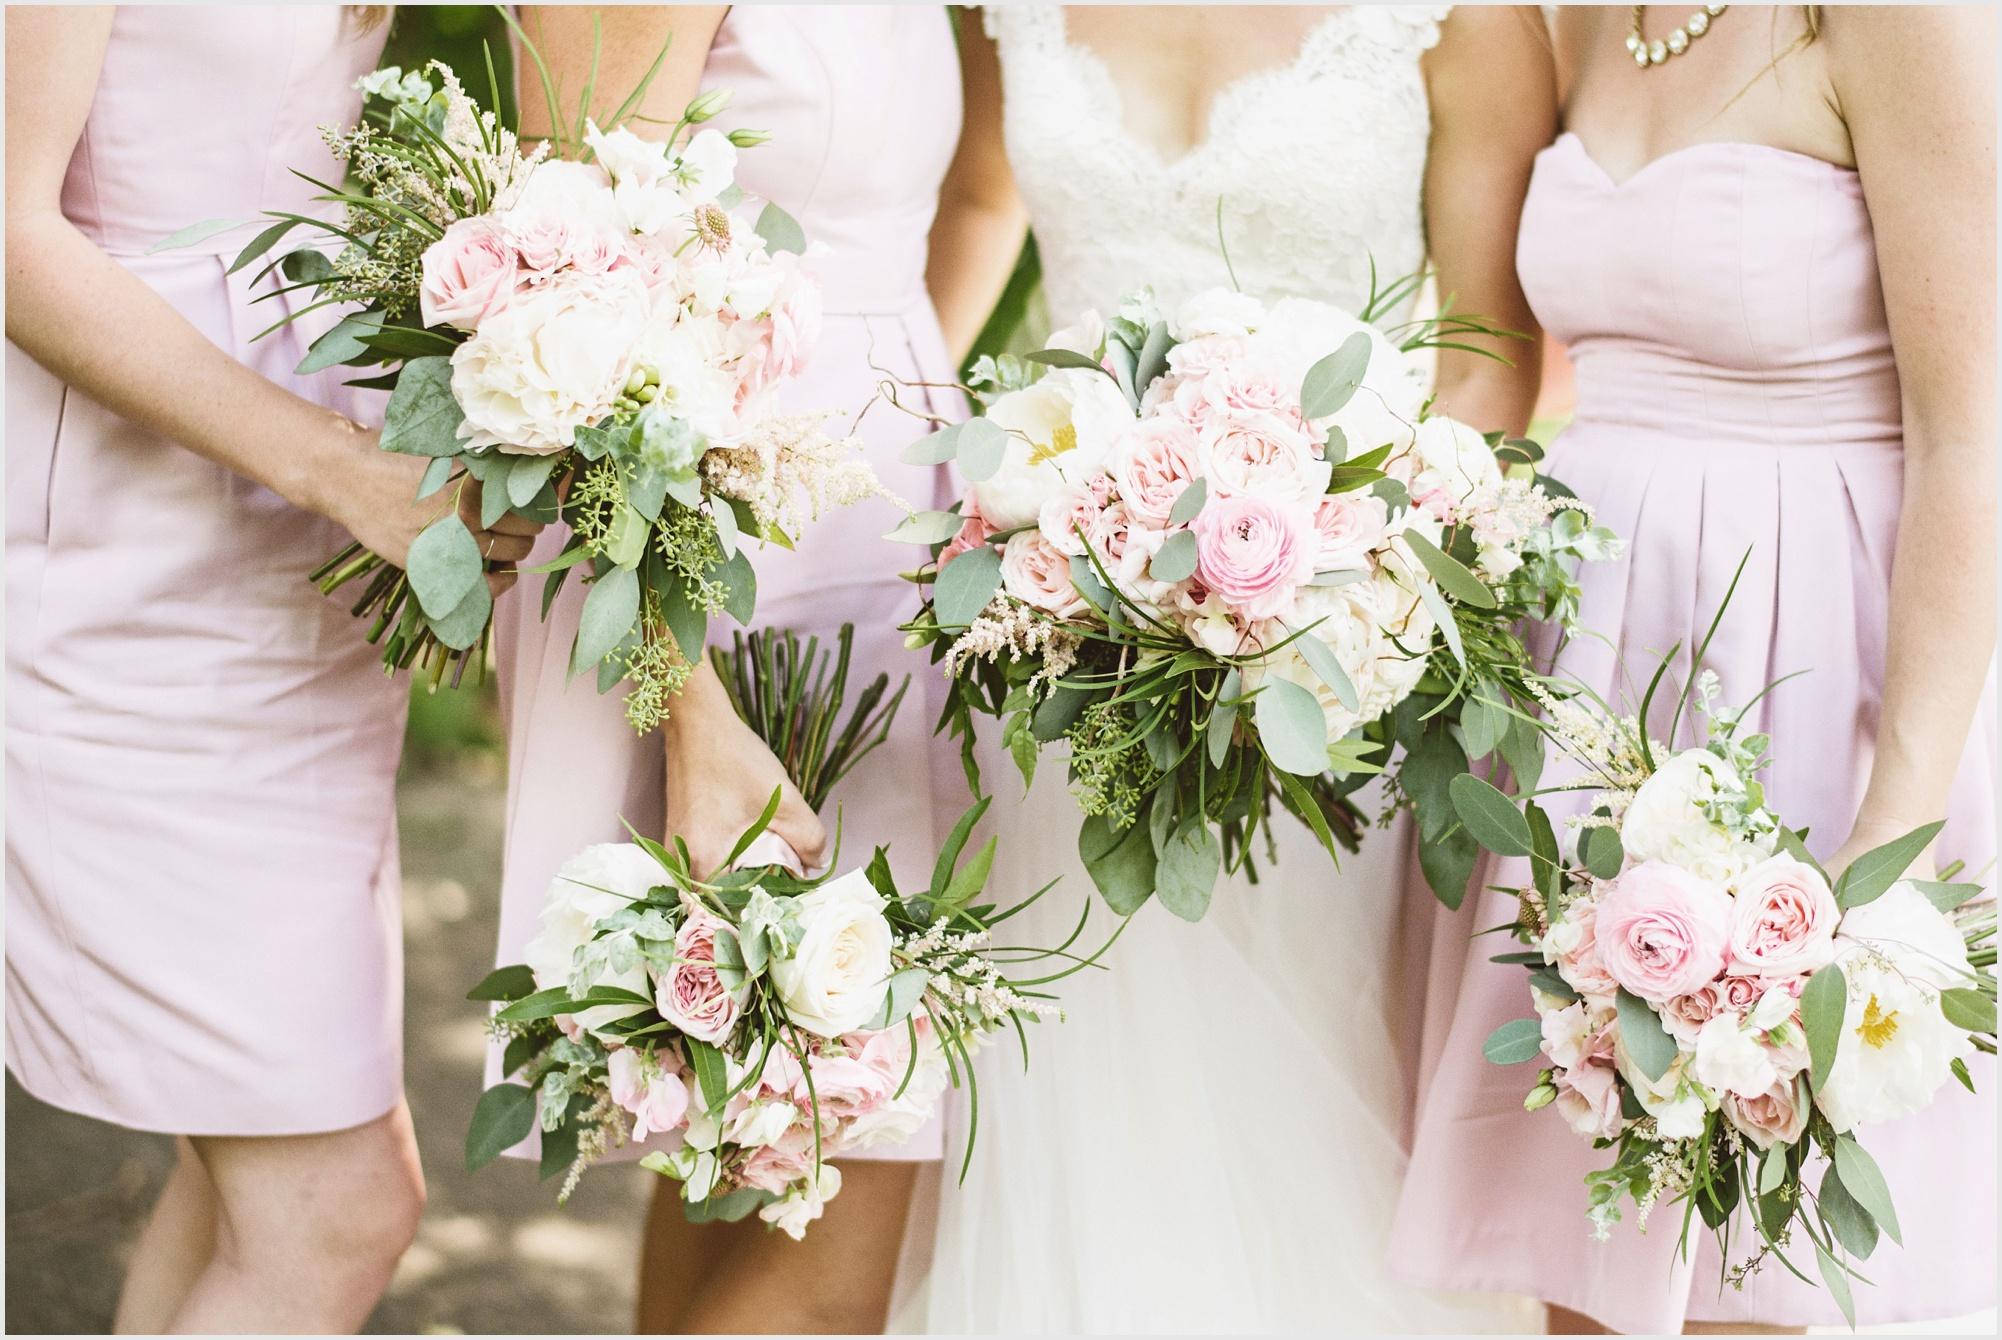 maura_david_james_j_hill_wedding_lucas_botz_photography_023.jpg